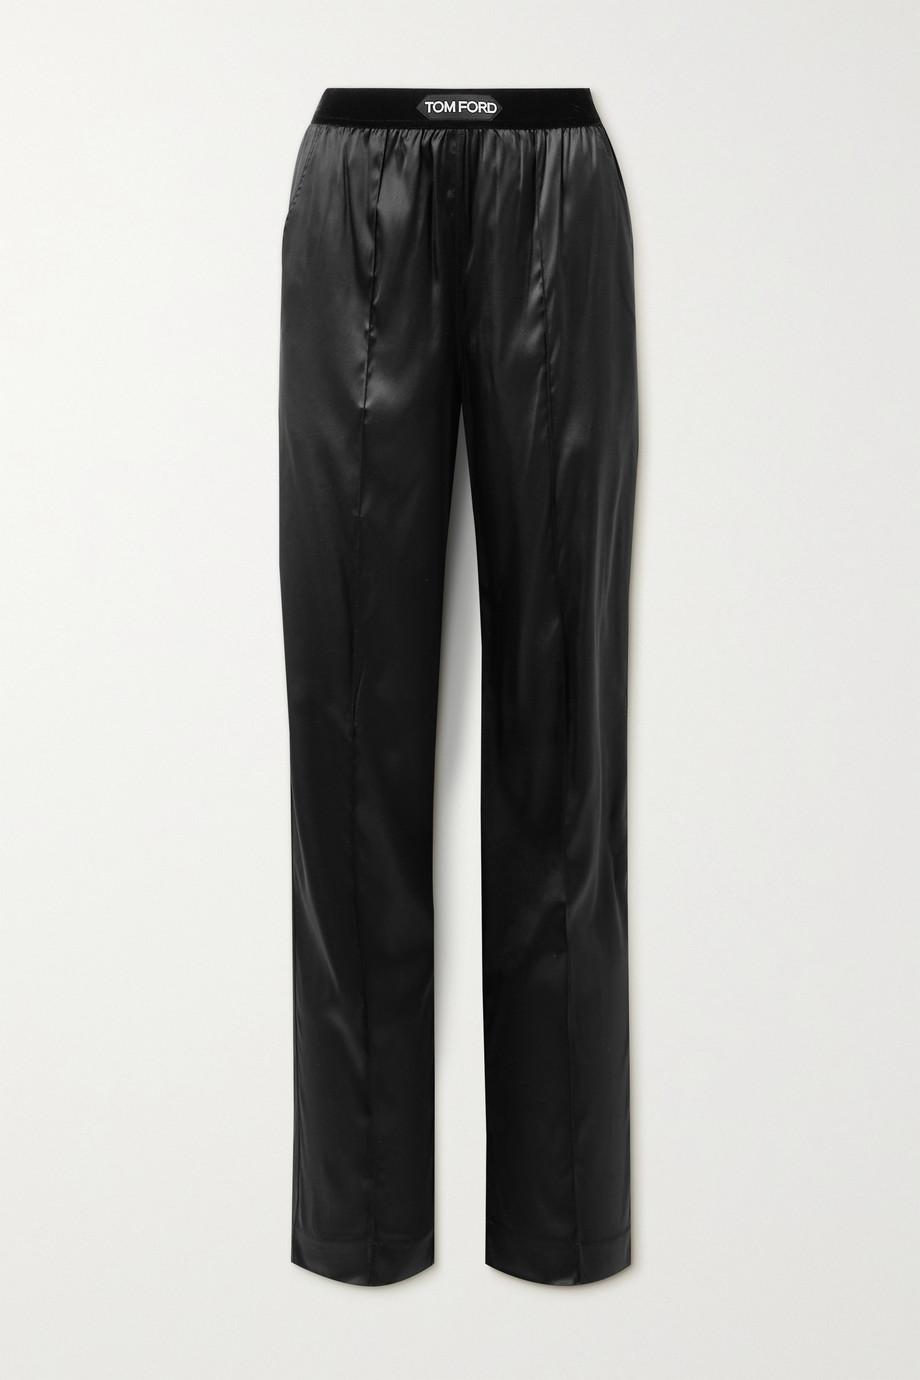 TOM FORD Velvet-trimmed stretch-silk satin pants